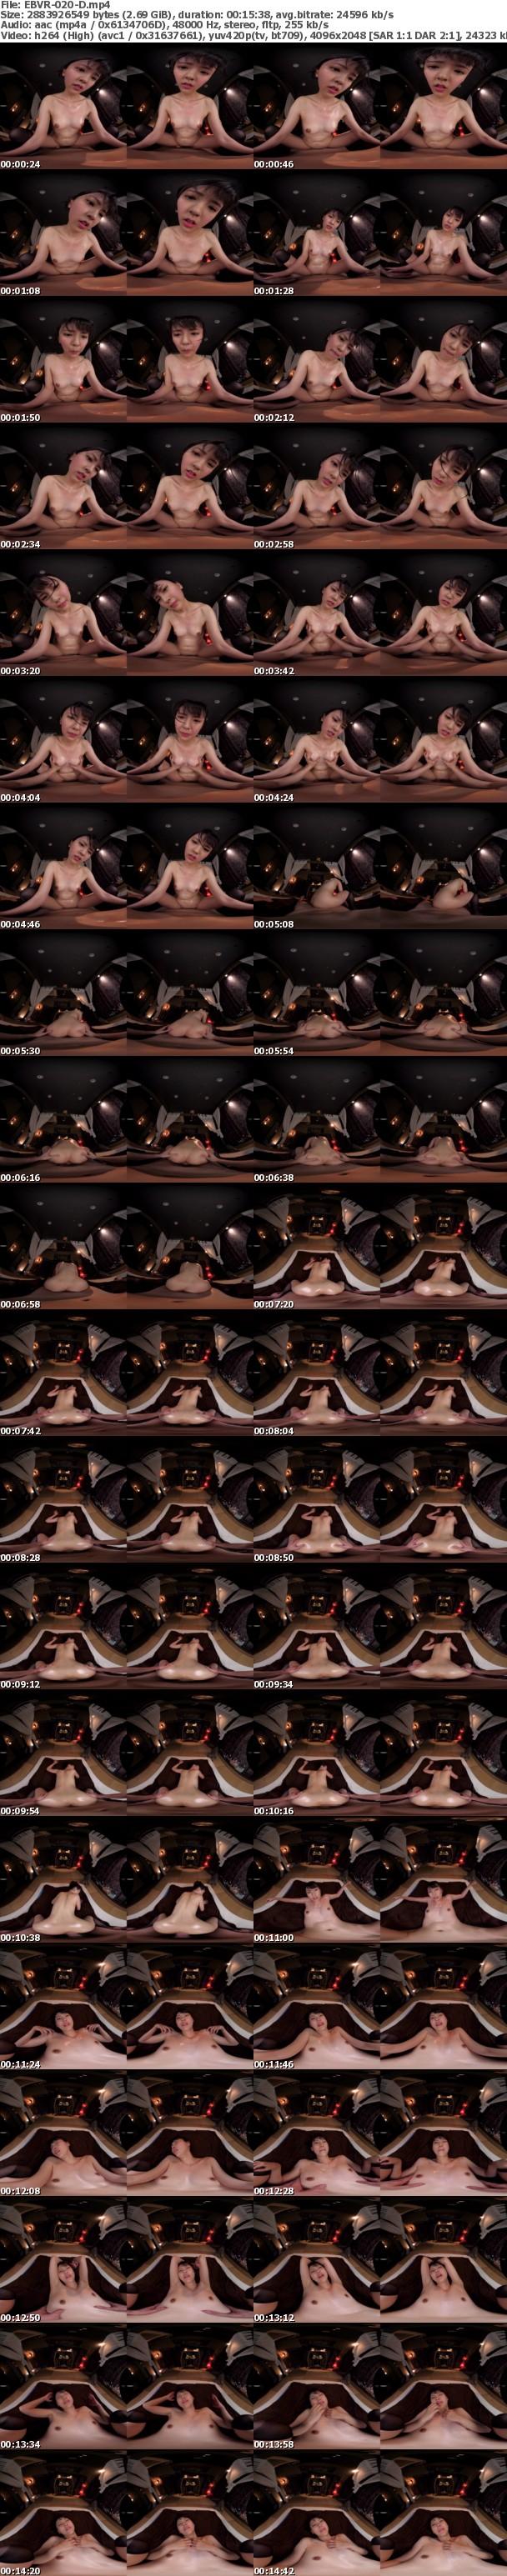 (VR) EBVR-020 尻とアナルのド迫力ヒップアングル! くびれ神尻エステティシャンのねちっこ~い杭打ちピストン騎乗位VR 立体視でとことん味わいつくす! 竹内夏希